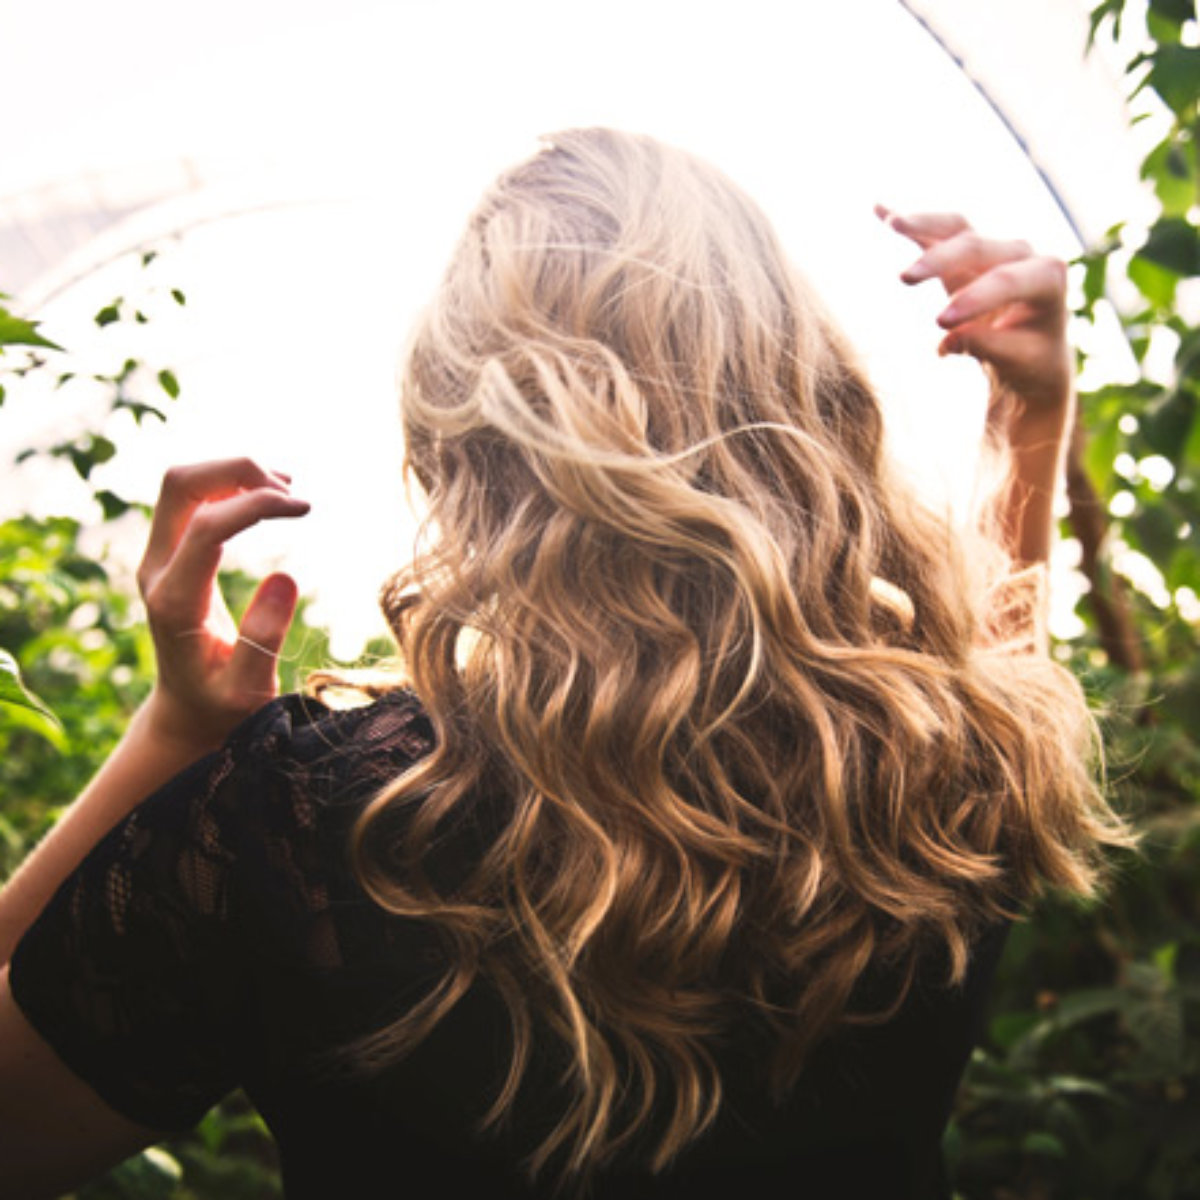 Beautiful Blonde walking in nature